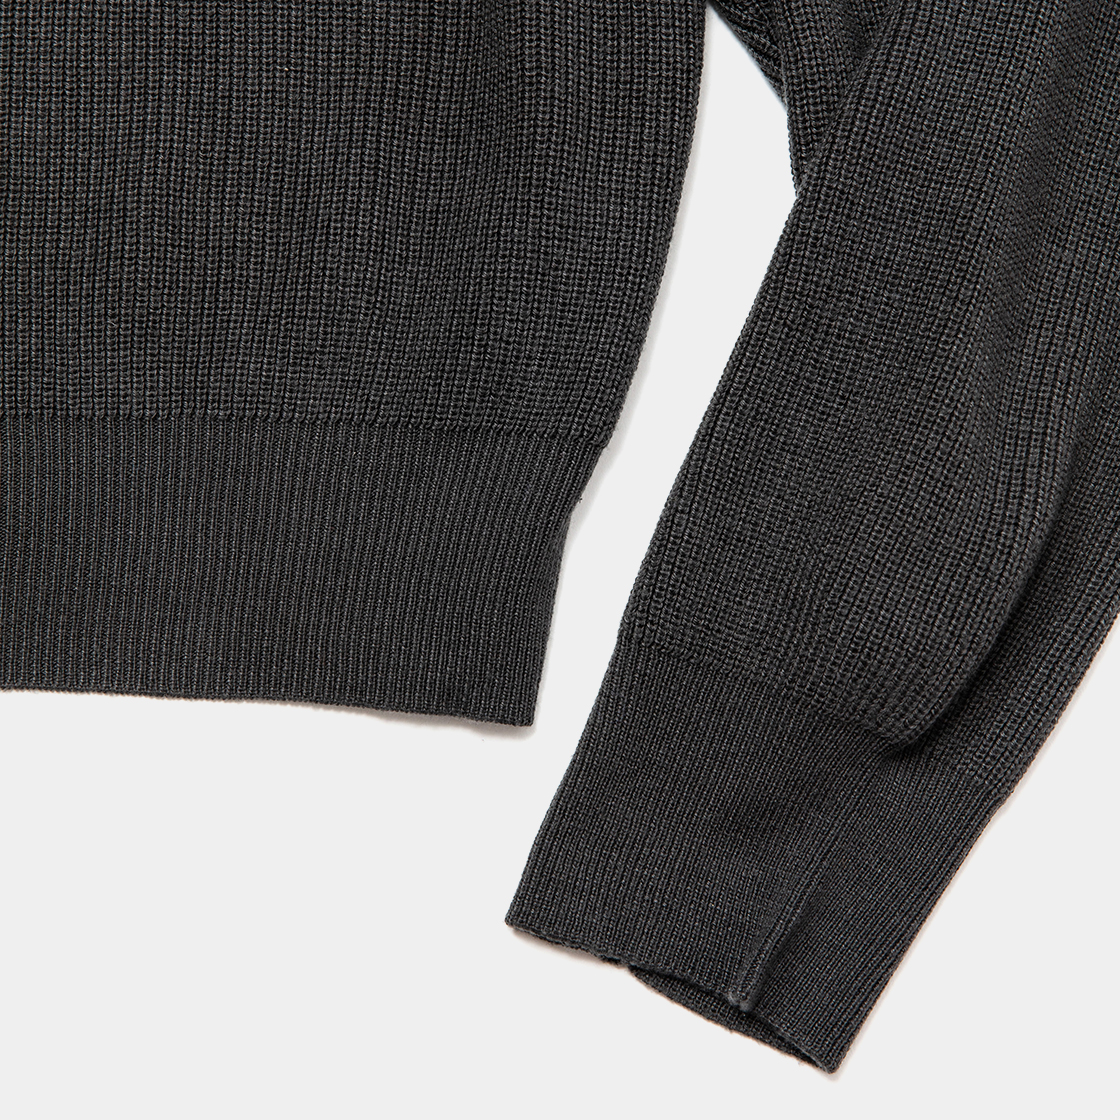 Cupra OP High Neck Knit / Charcoal